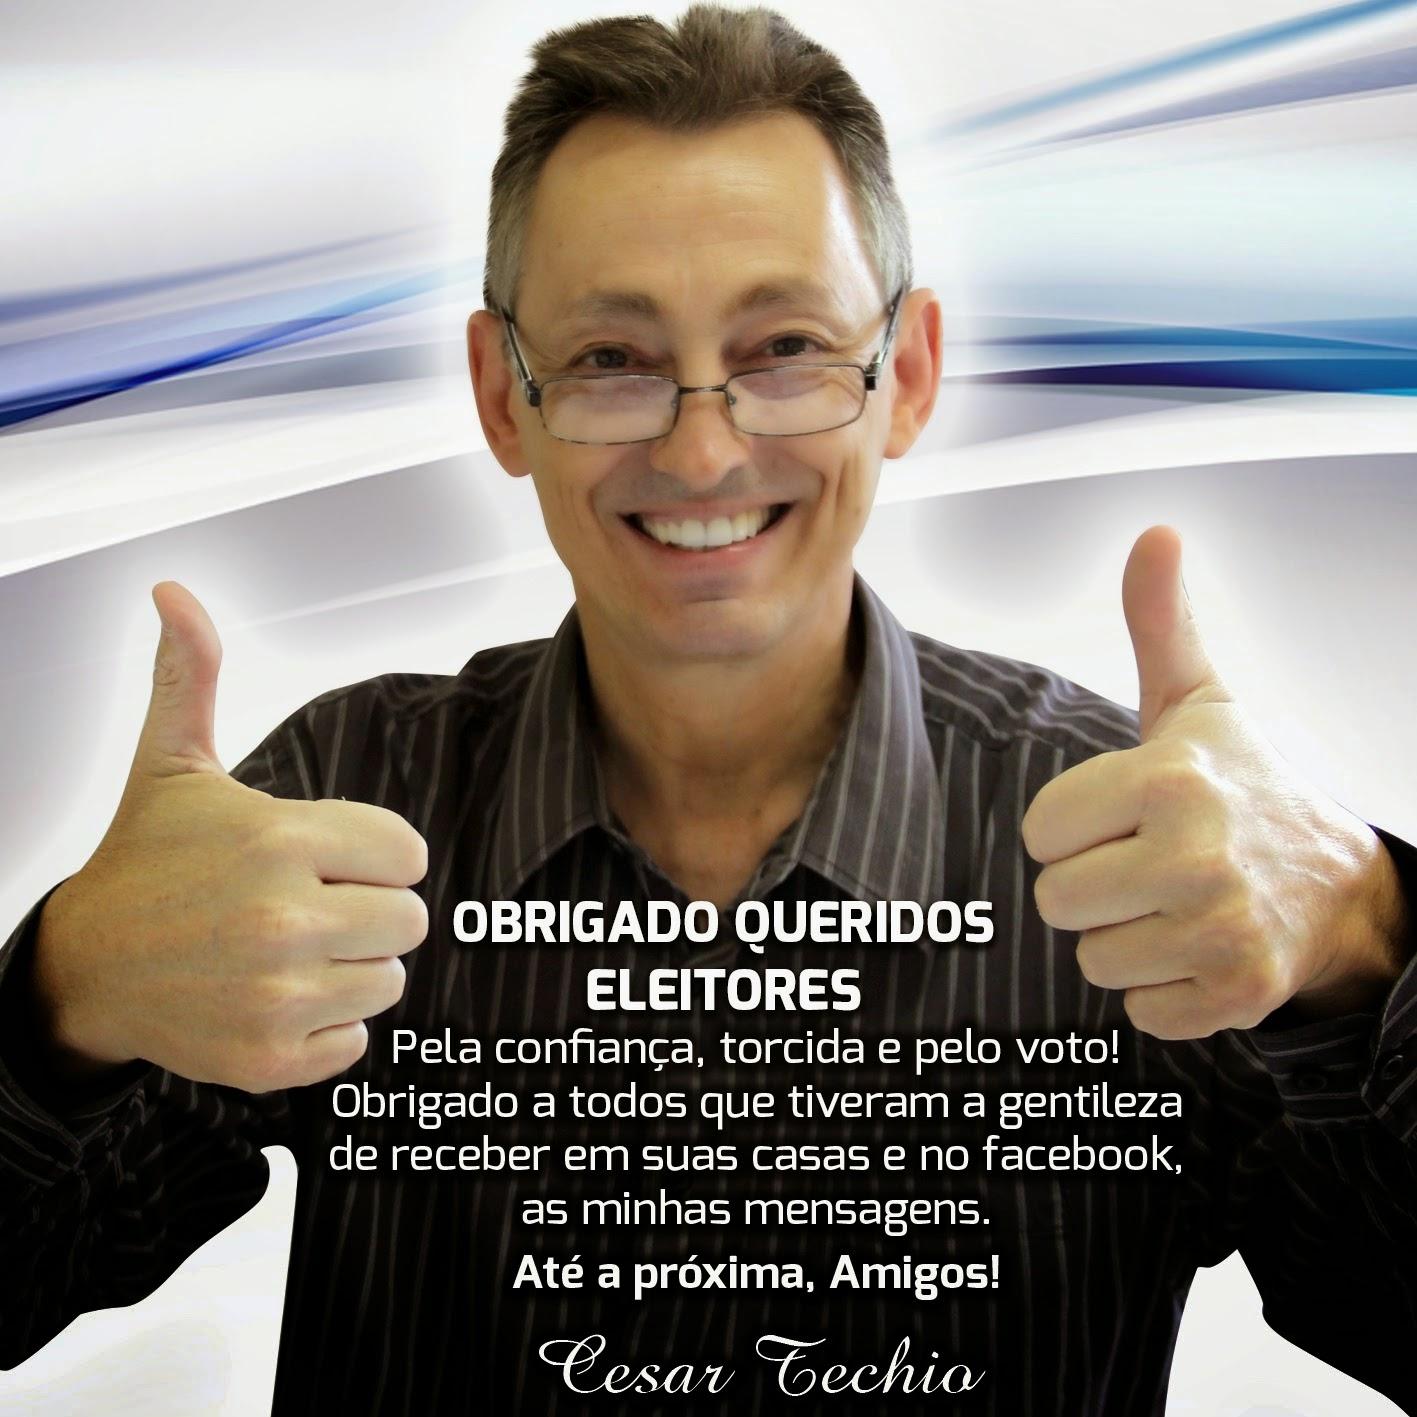 OBRIGADO AMIGOS.